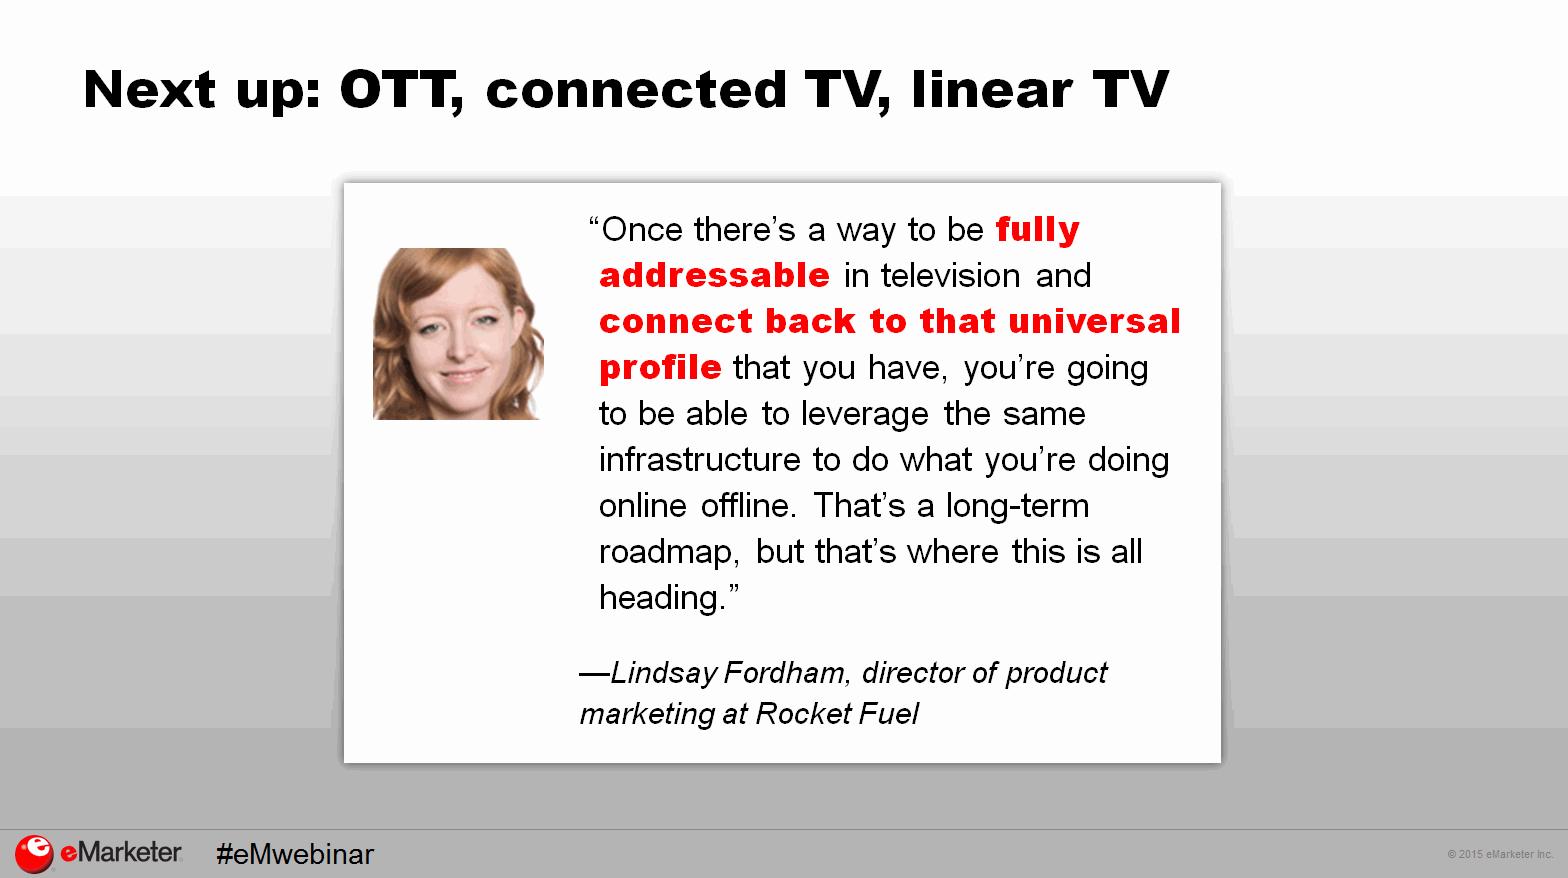 What's the long-term roadmap for programmatic TV? #eMwebinar http://t.co/KPsQ7oxbi9